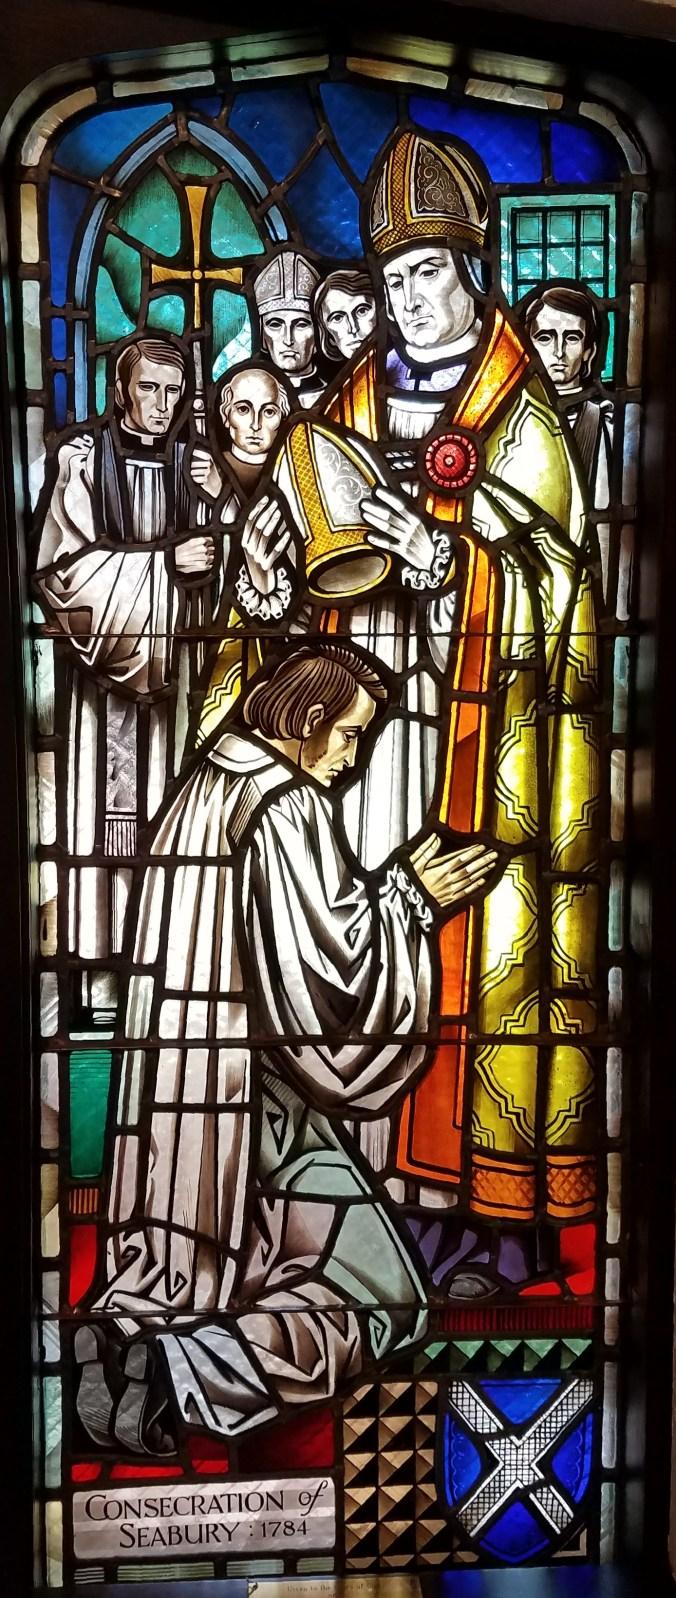 Consecration of Seabury